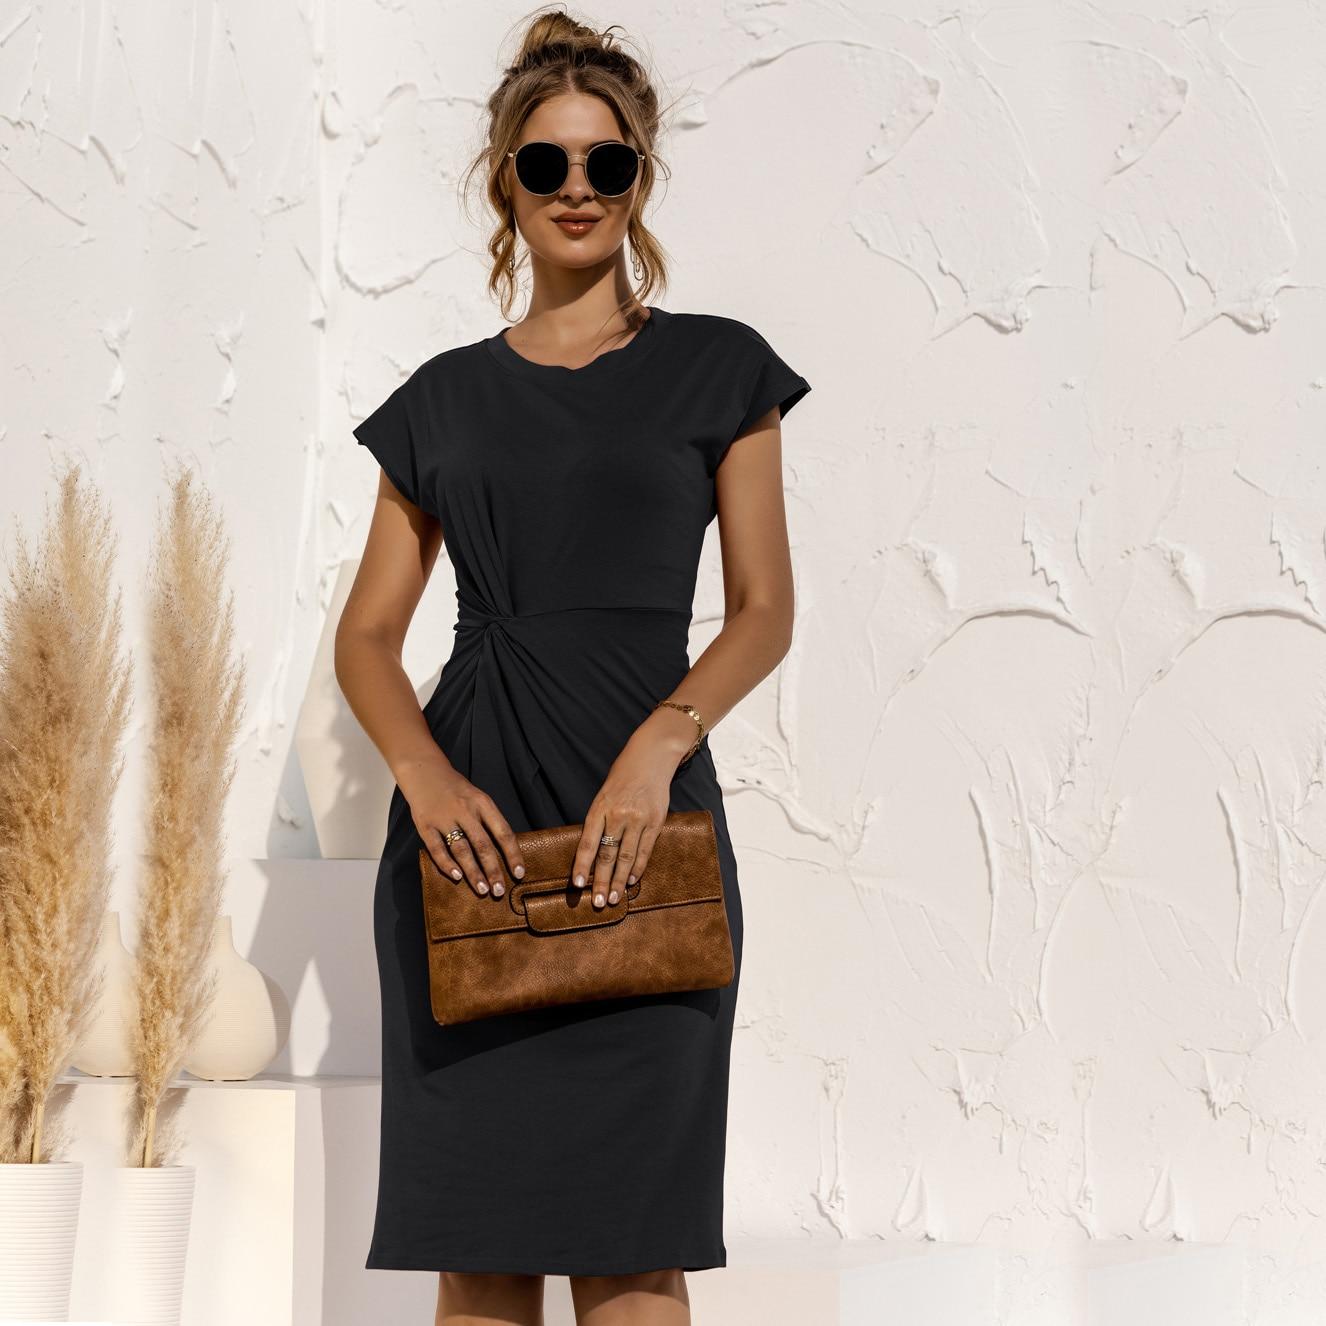 women knitted slim dress 202 summer Trumpet O-Neck short sleeve Empire Waist Slim Solid Straps Mid-calf knitted Dress 8